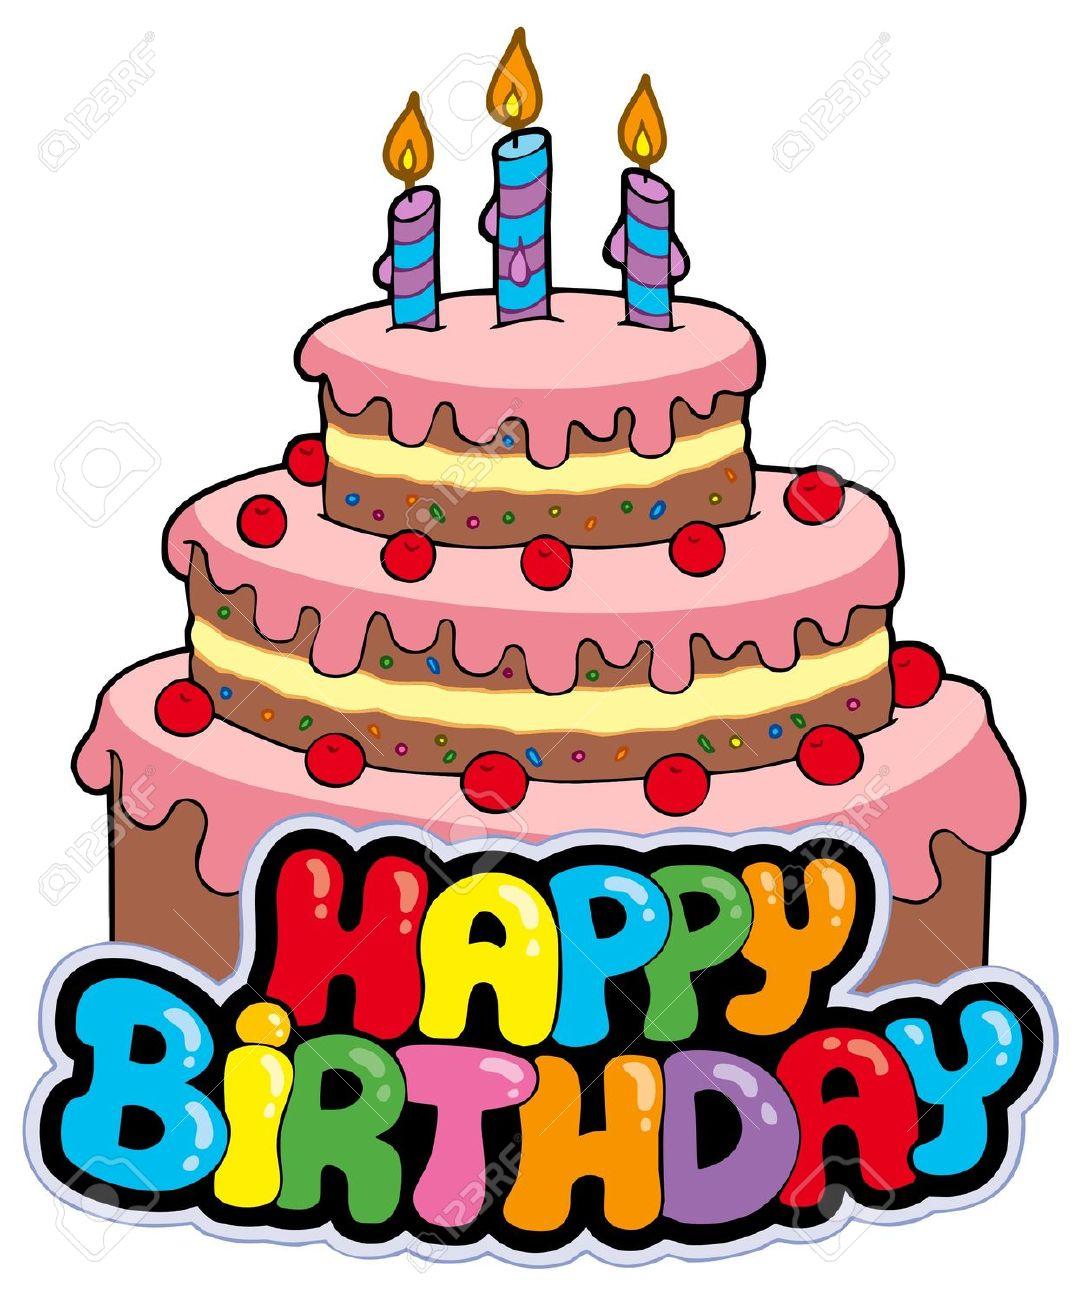 Happy Birthday Cake Clipart .-Happy Birthday Cake Clipart .-10